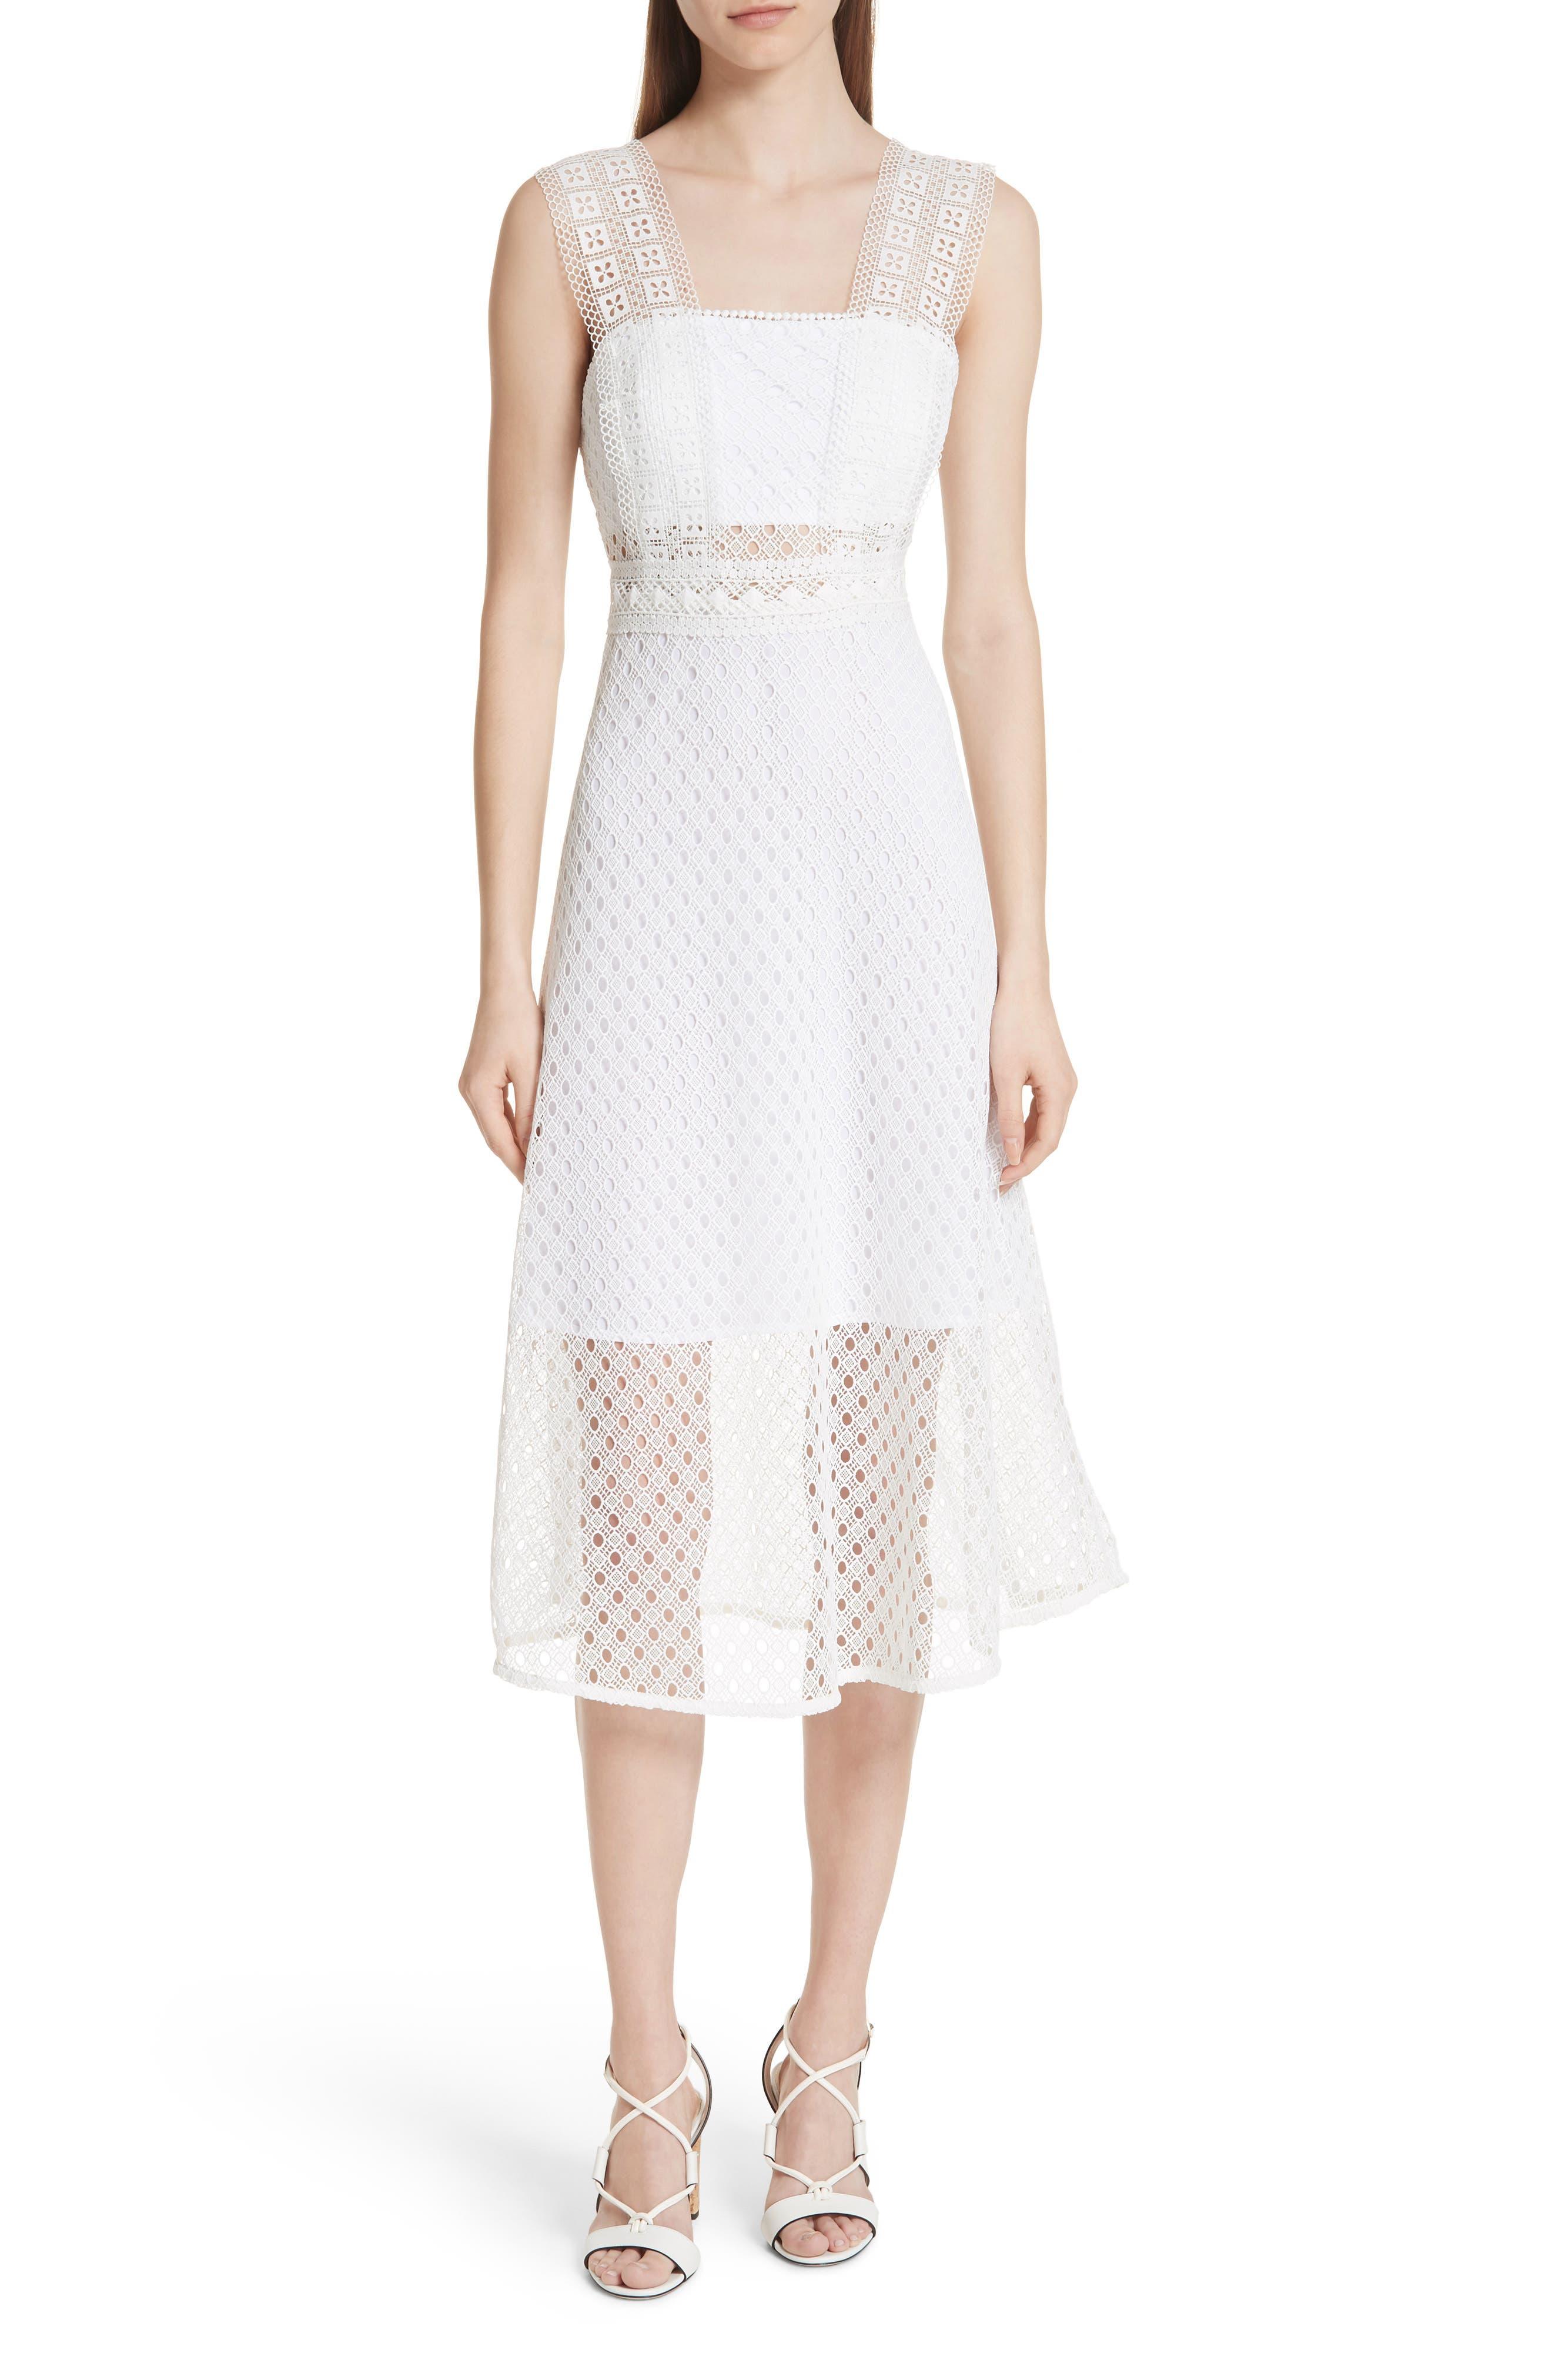 Blanc Lace Square Neck Dress,                         Main,                         color, White